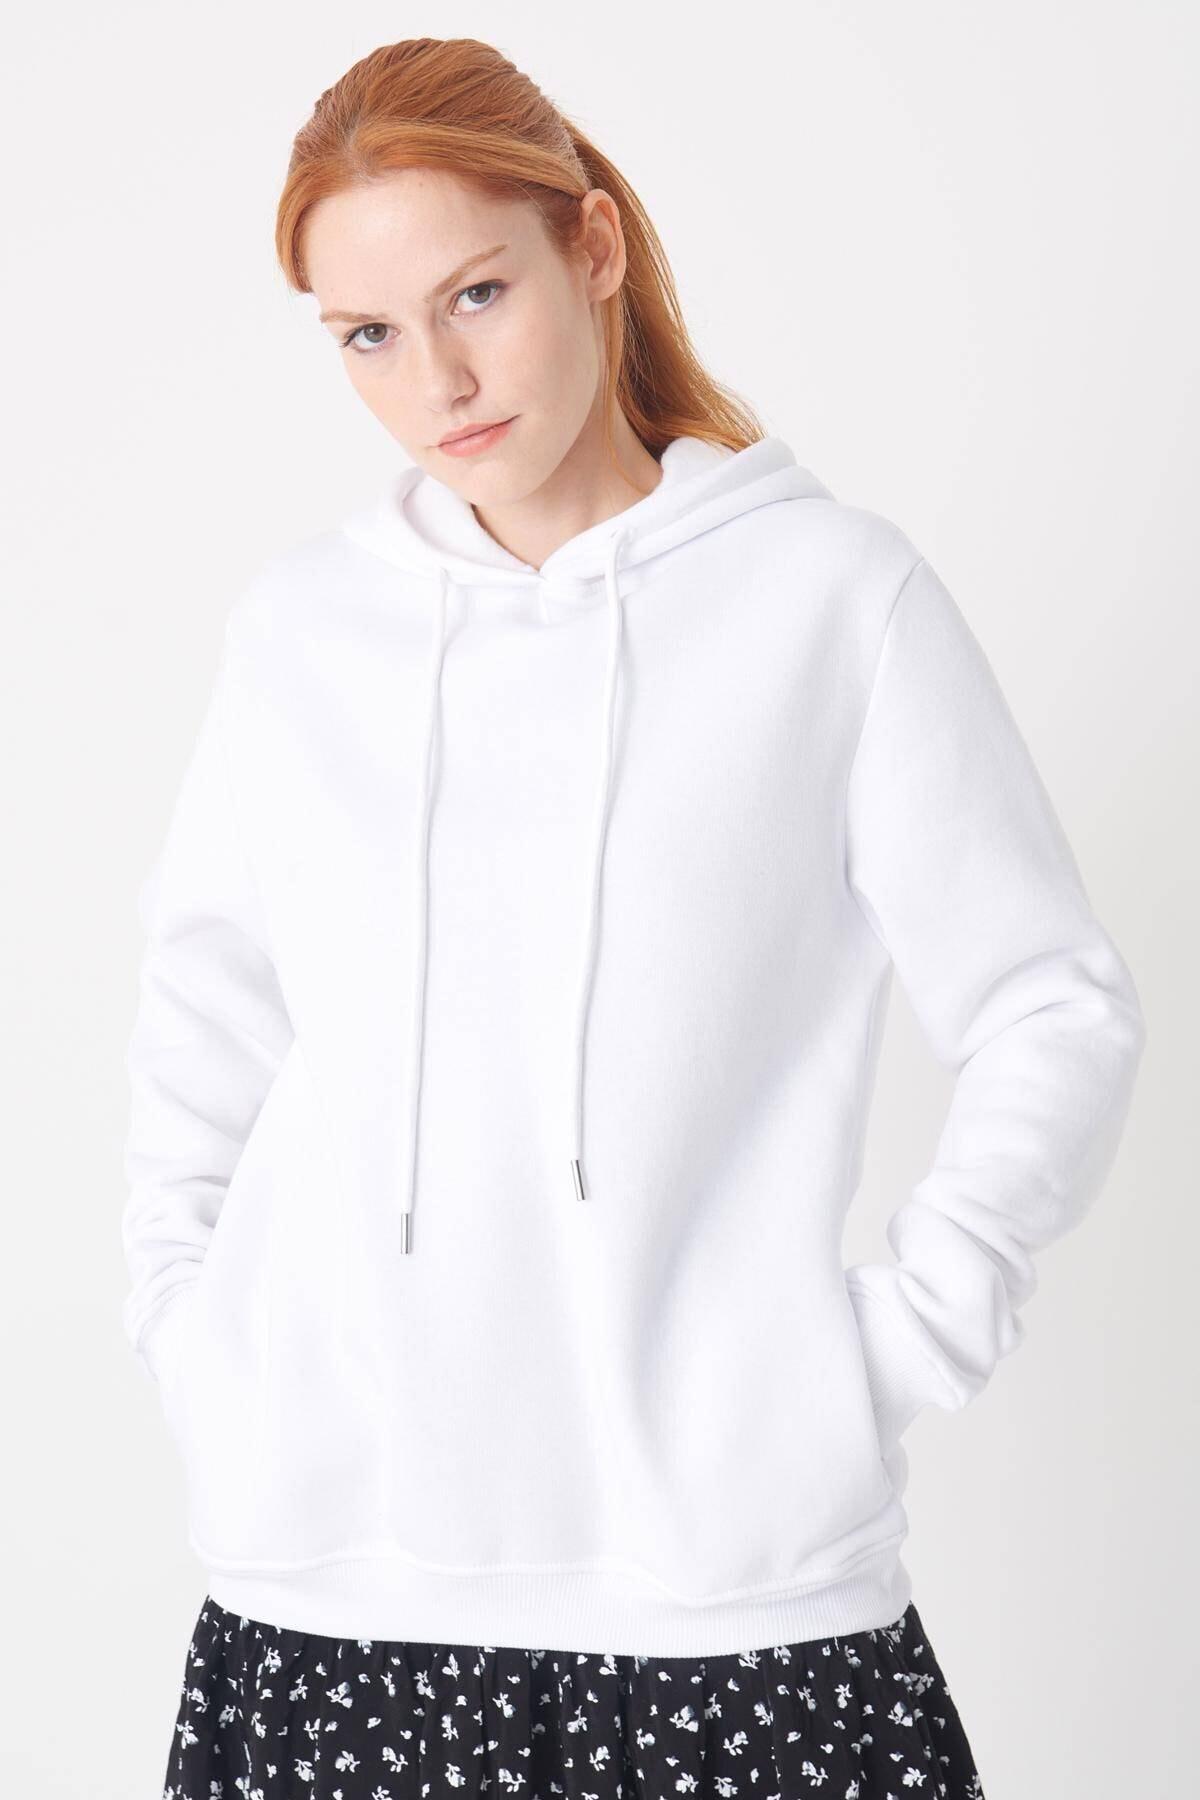 Addax Kadın Beyaz Kapşonlu Sweat S0808 - DK1 ADX-0000021231 2